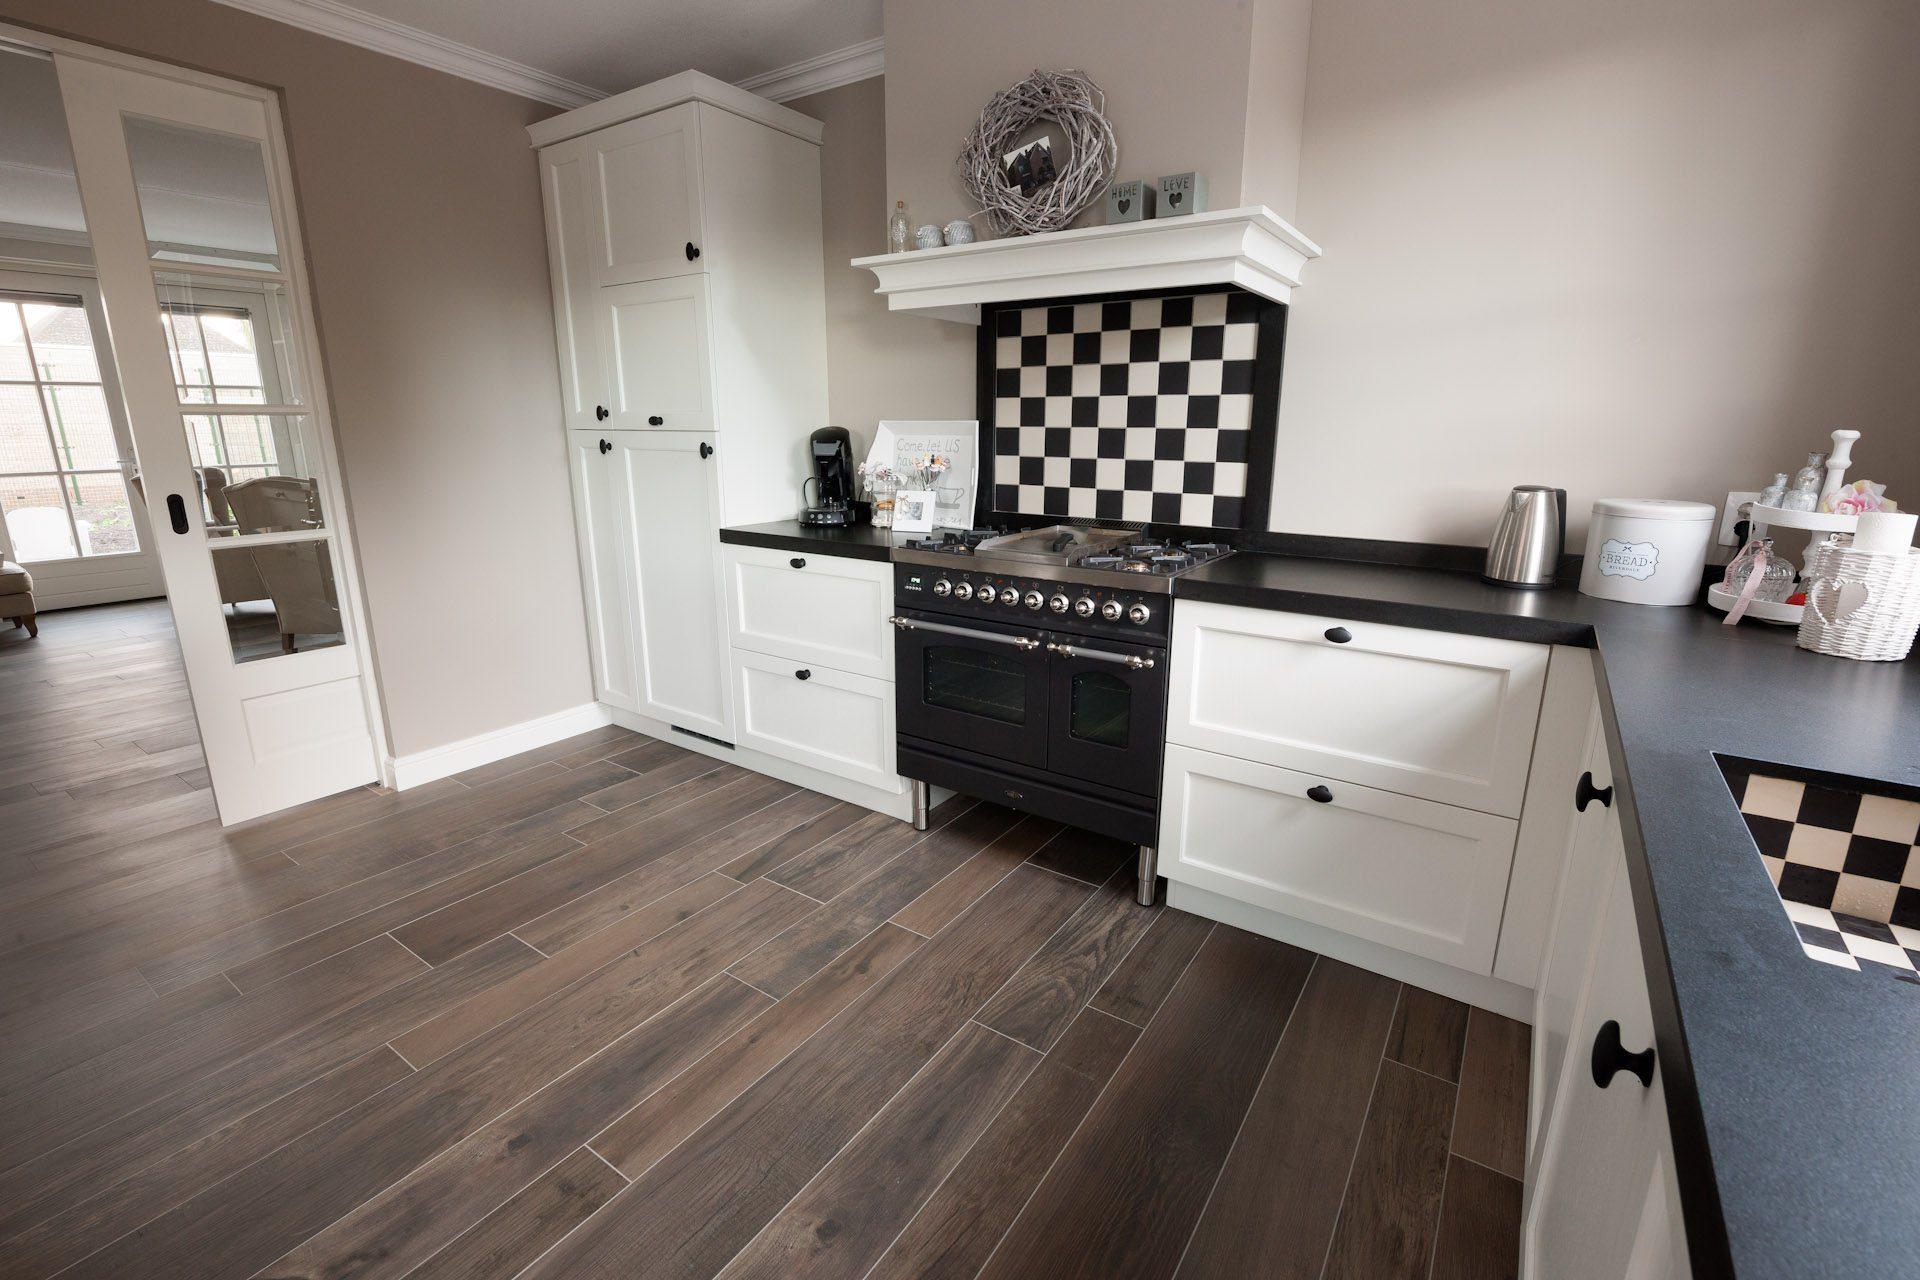 Houtlook tegels in woonkamer zwartwit geblokte vloer in hal